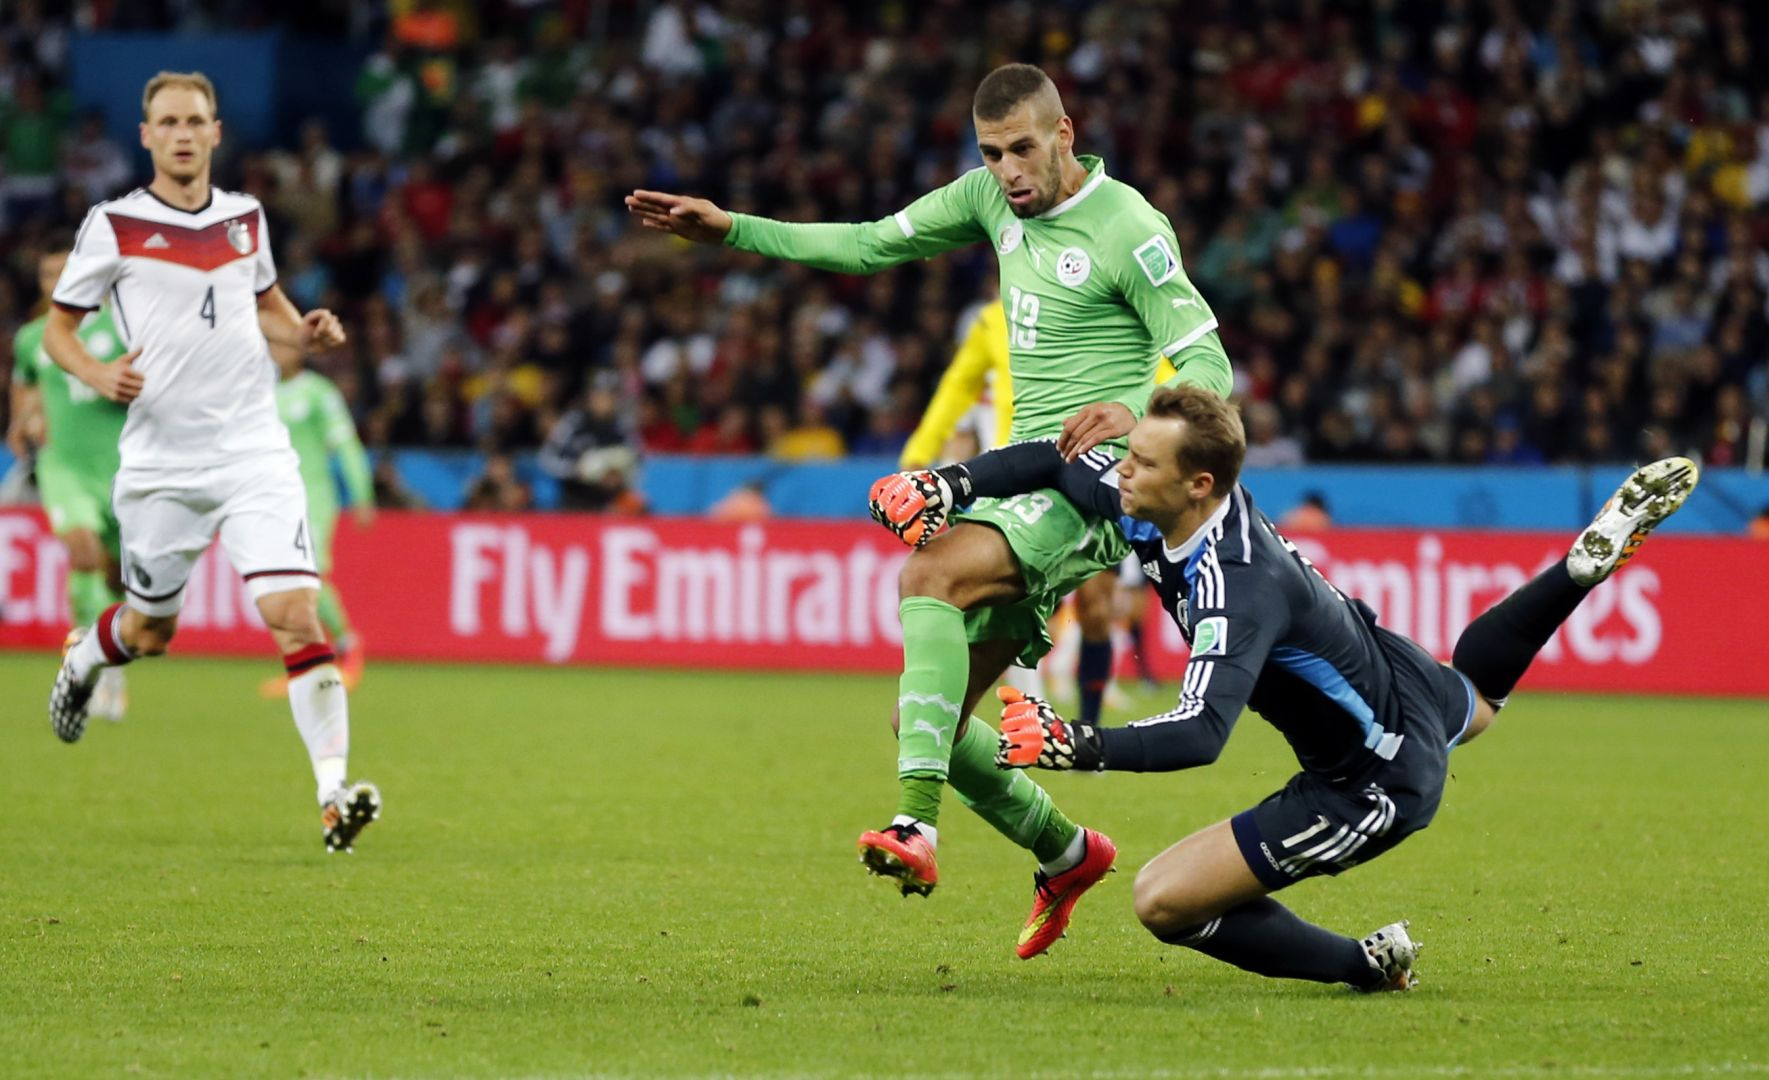 aptopix-brazil-soccer-wcup-germany-algeria-jpeg-02d4e